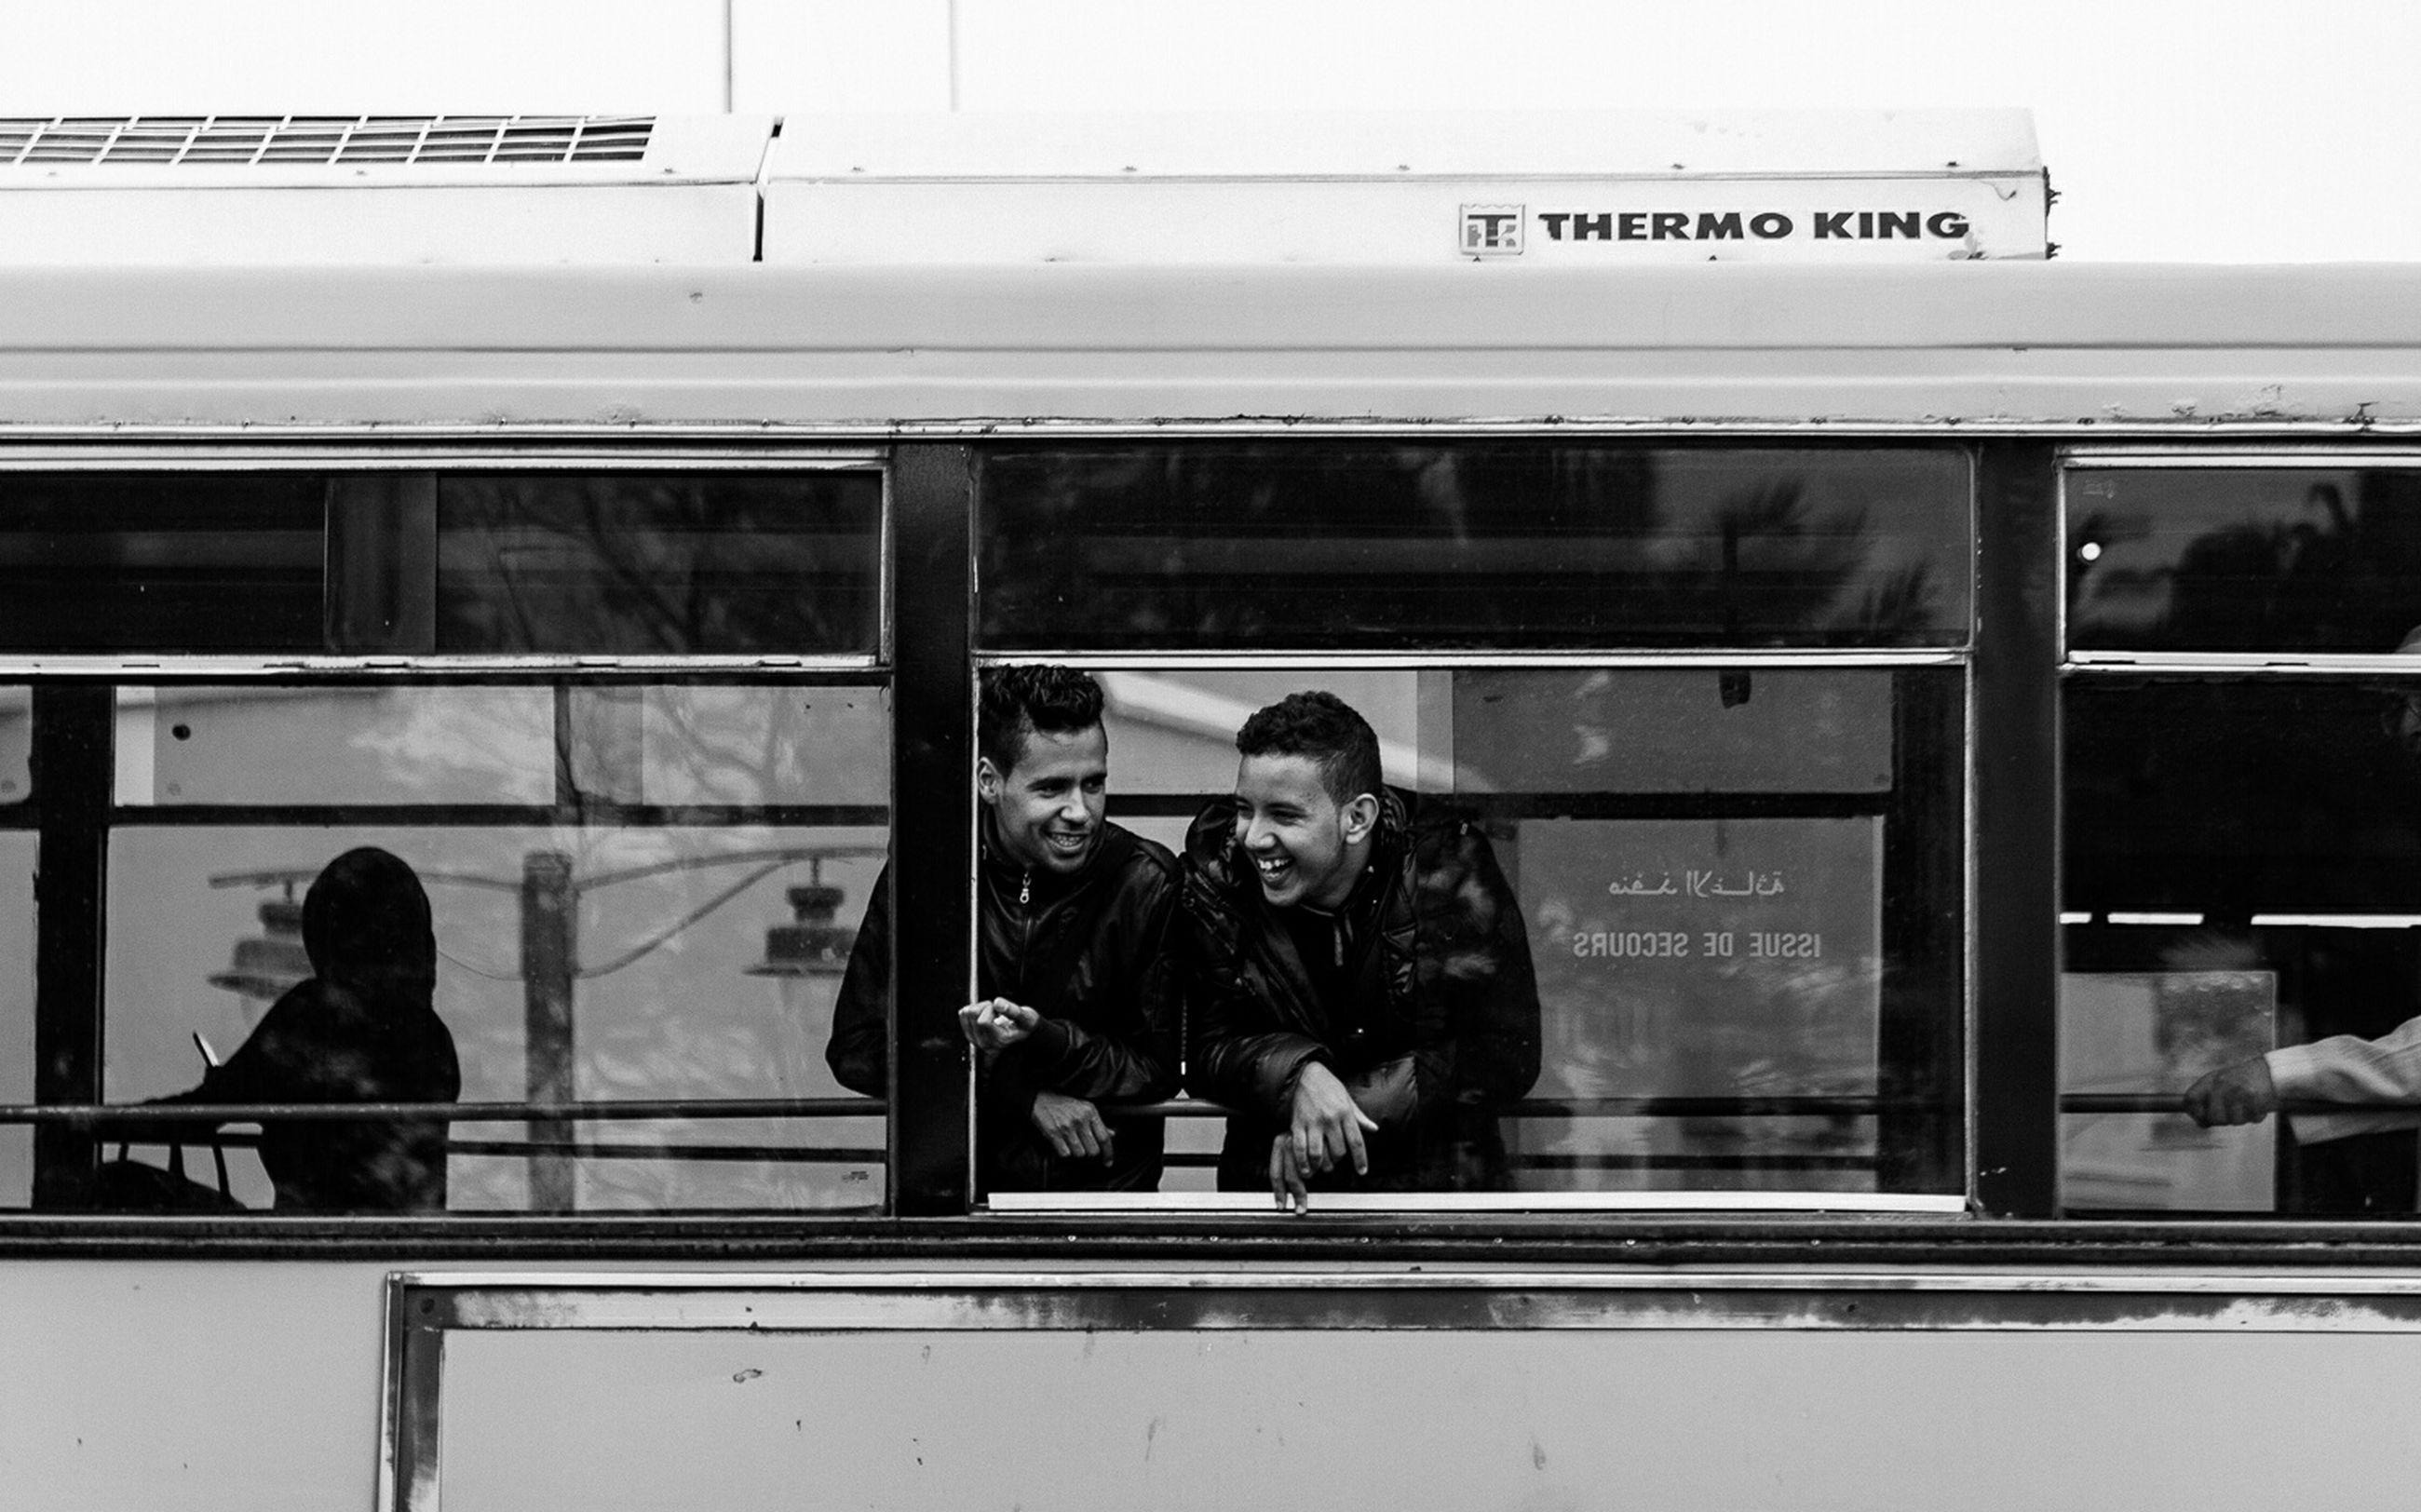 transportation, men, public transportation, text, communication, lifestyles, western script, mode of transport, railroad station, indoors, person, train - vehicle, travel, rail transportation, non-western script, railroad station platform, leisure activity, passenger